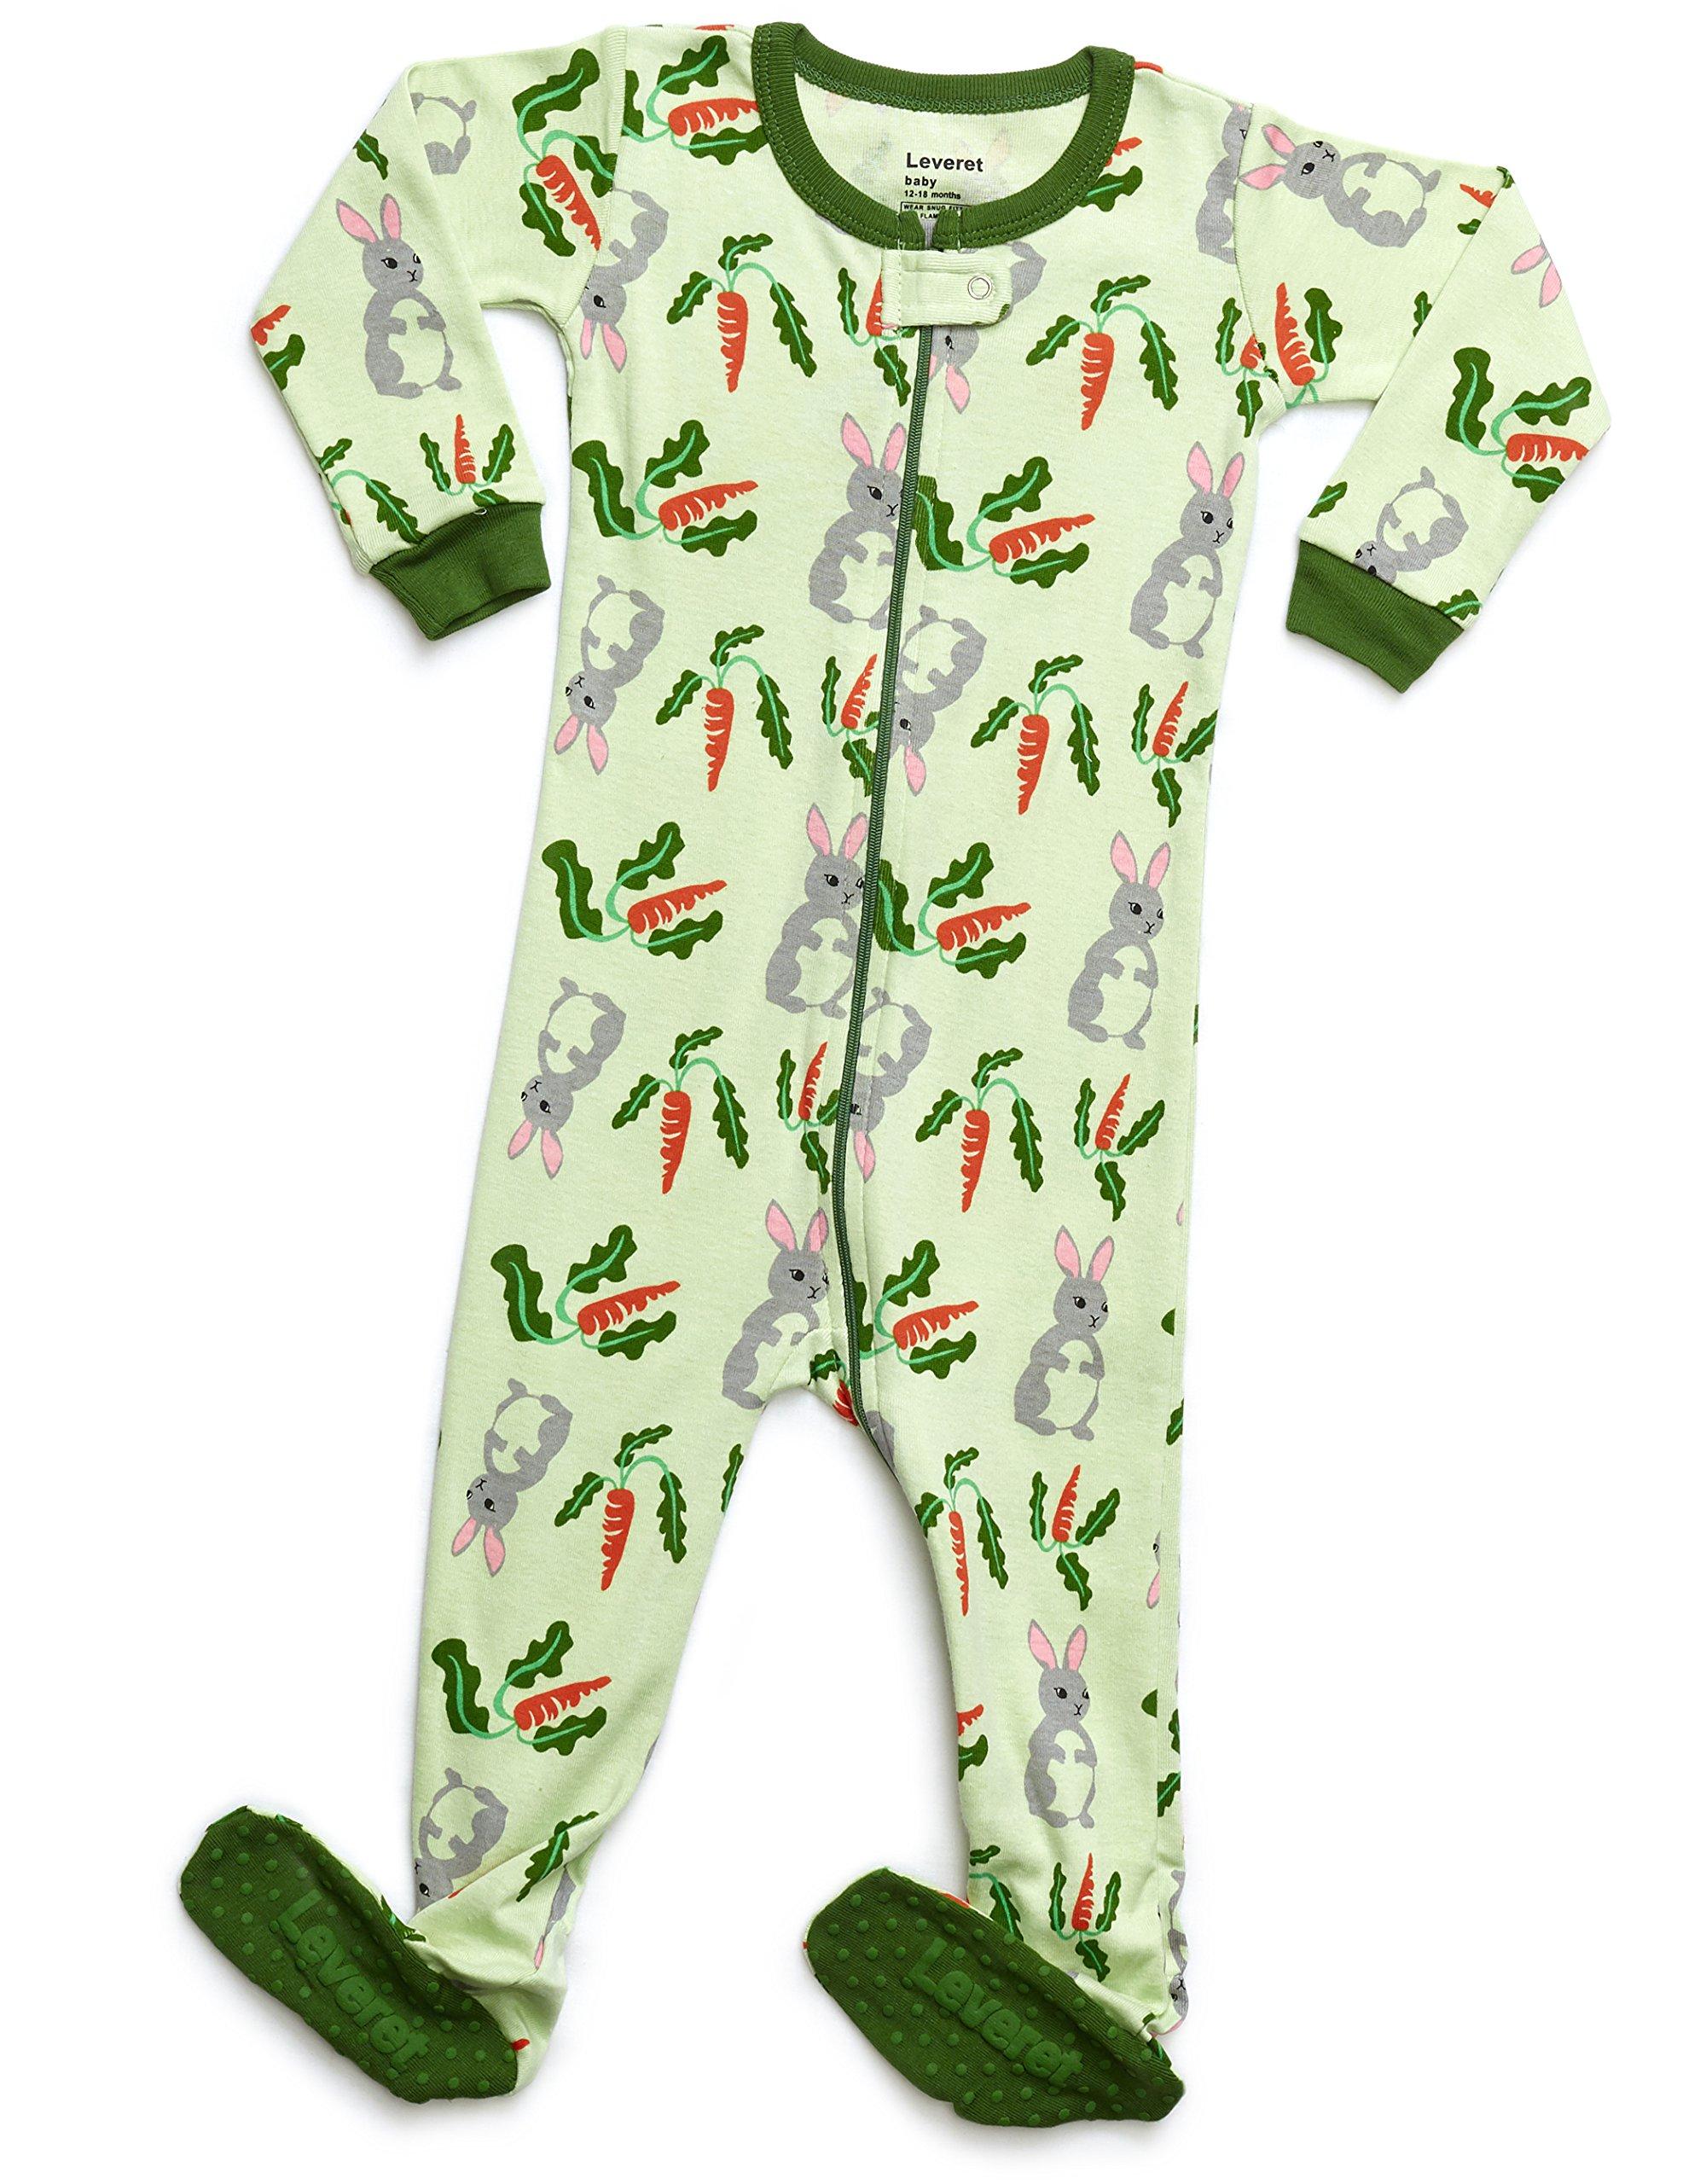 Leveret Kids Organic Cotton Rabbit Baby Boys Girls